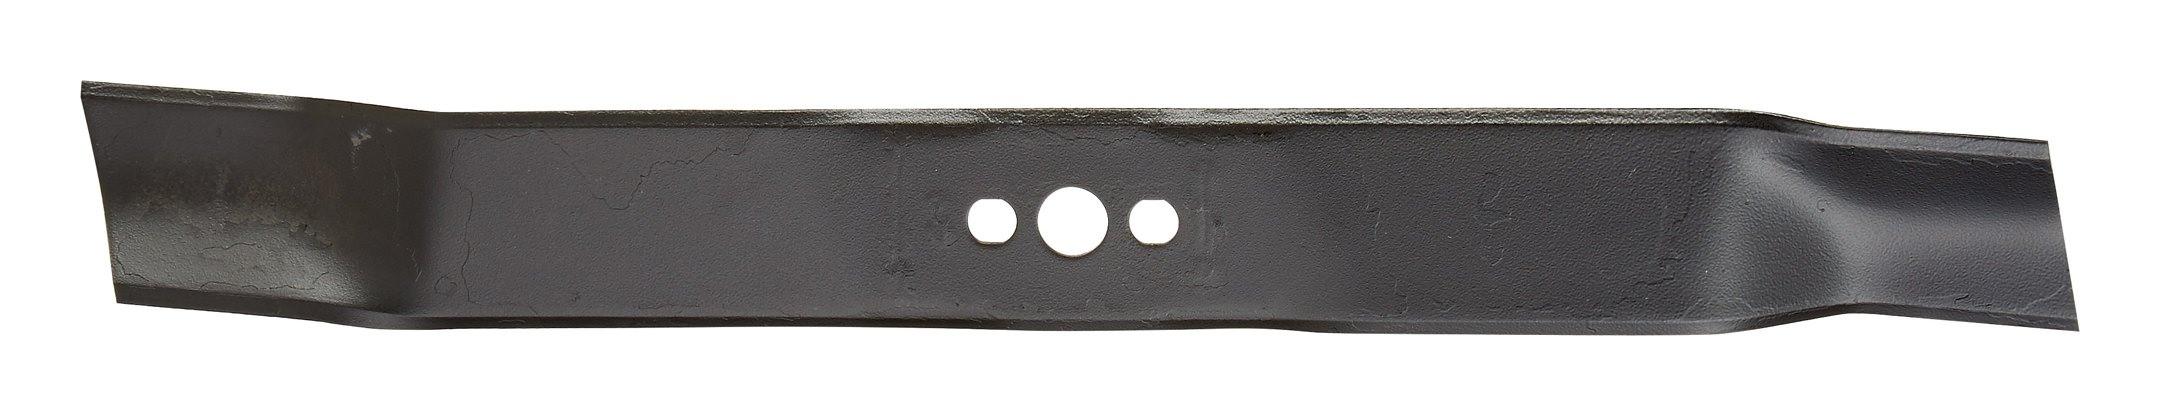 McCulloch Benzin-Mäher Mulchmesser 50 cm MBO 020 - 531025220